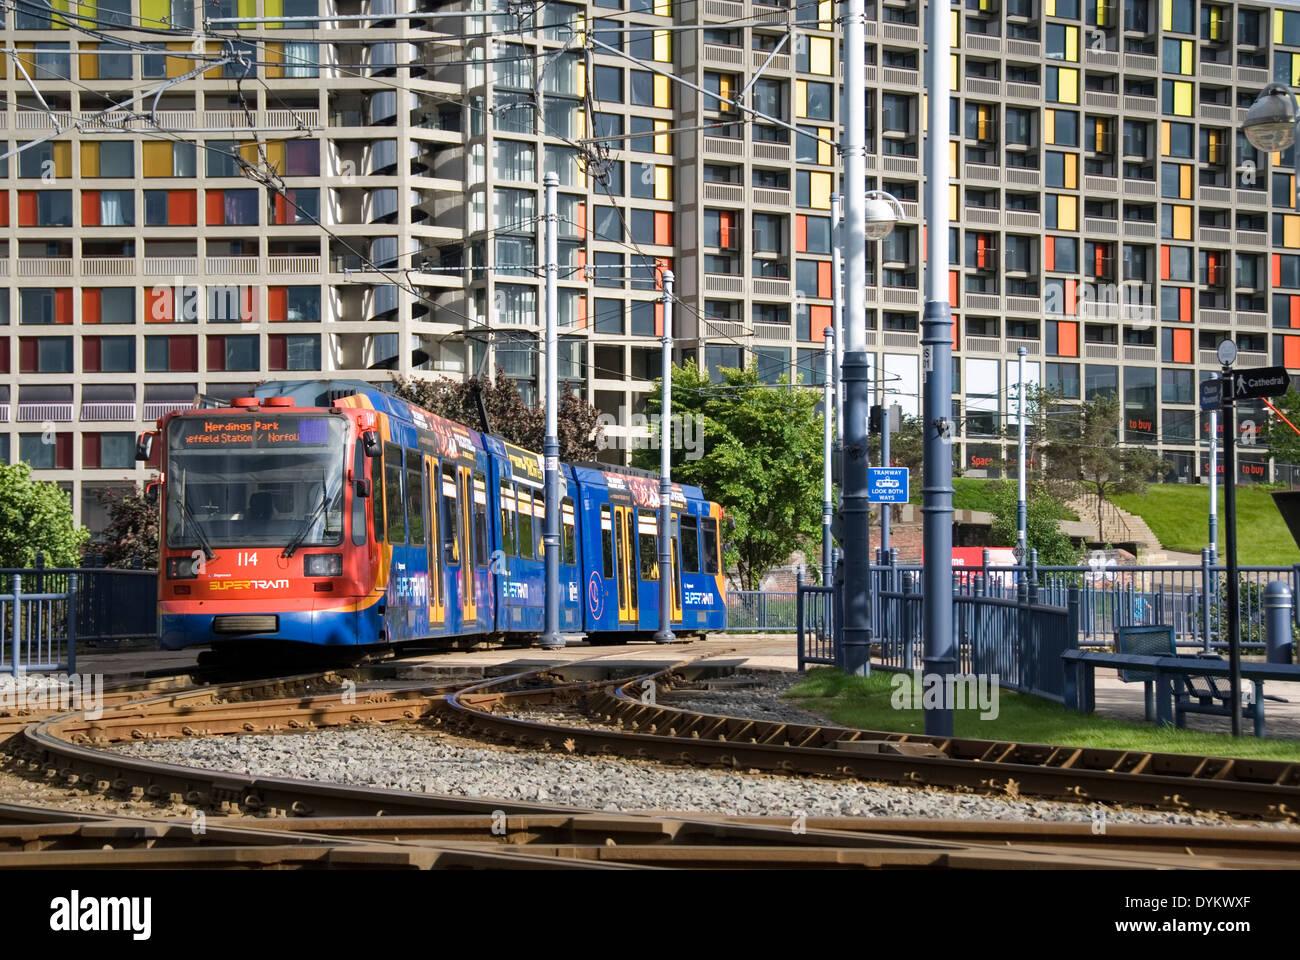 Park Square, Sheffield, UK, 22 June 2013 : Tram on supertram tram ...